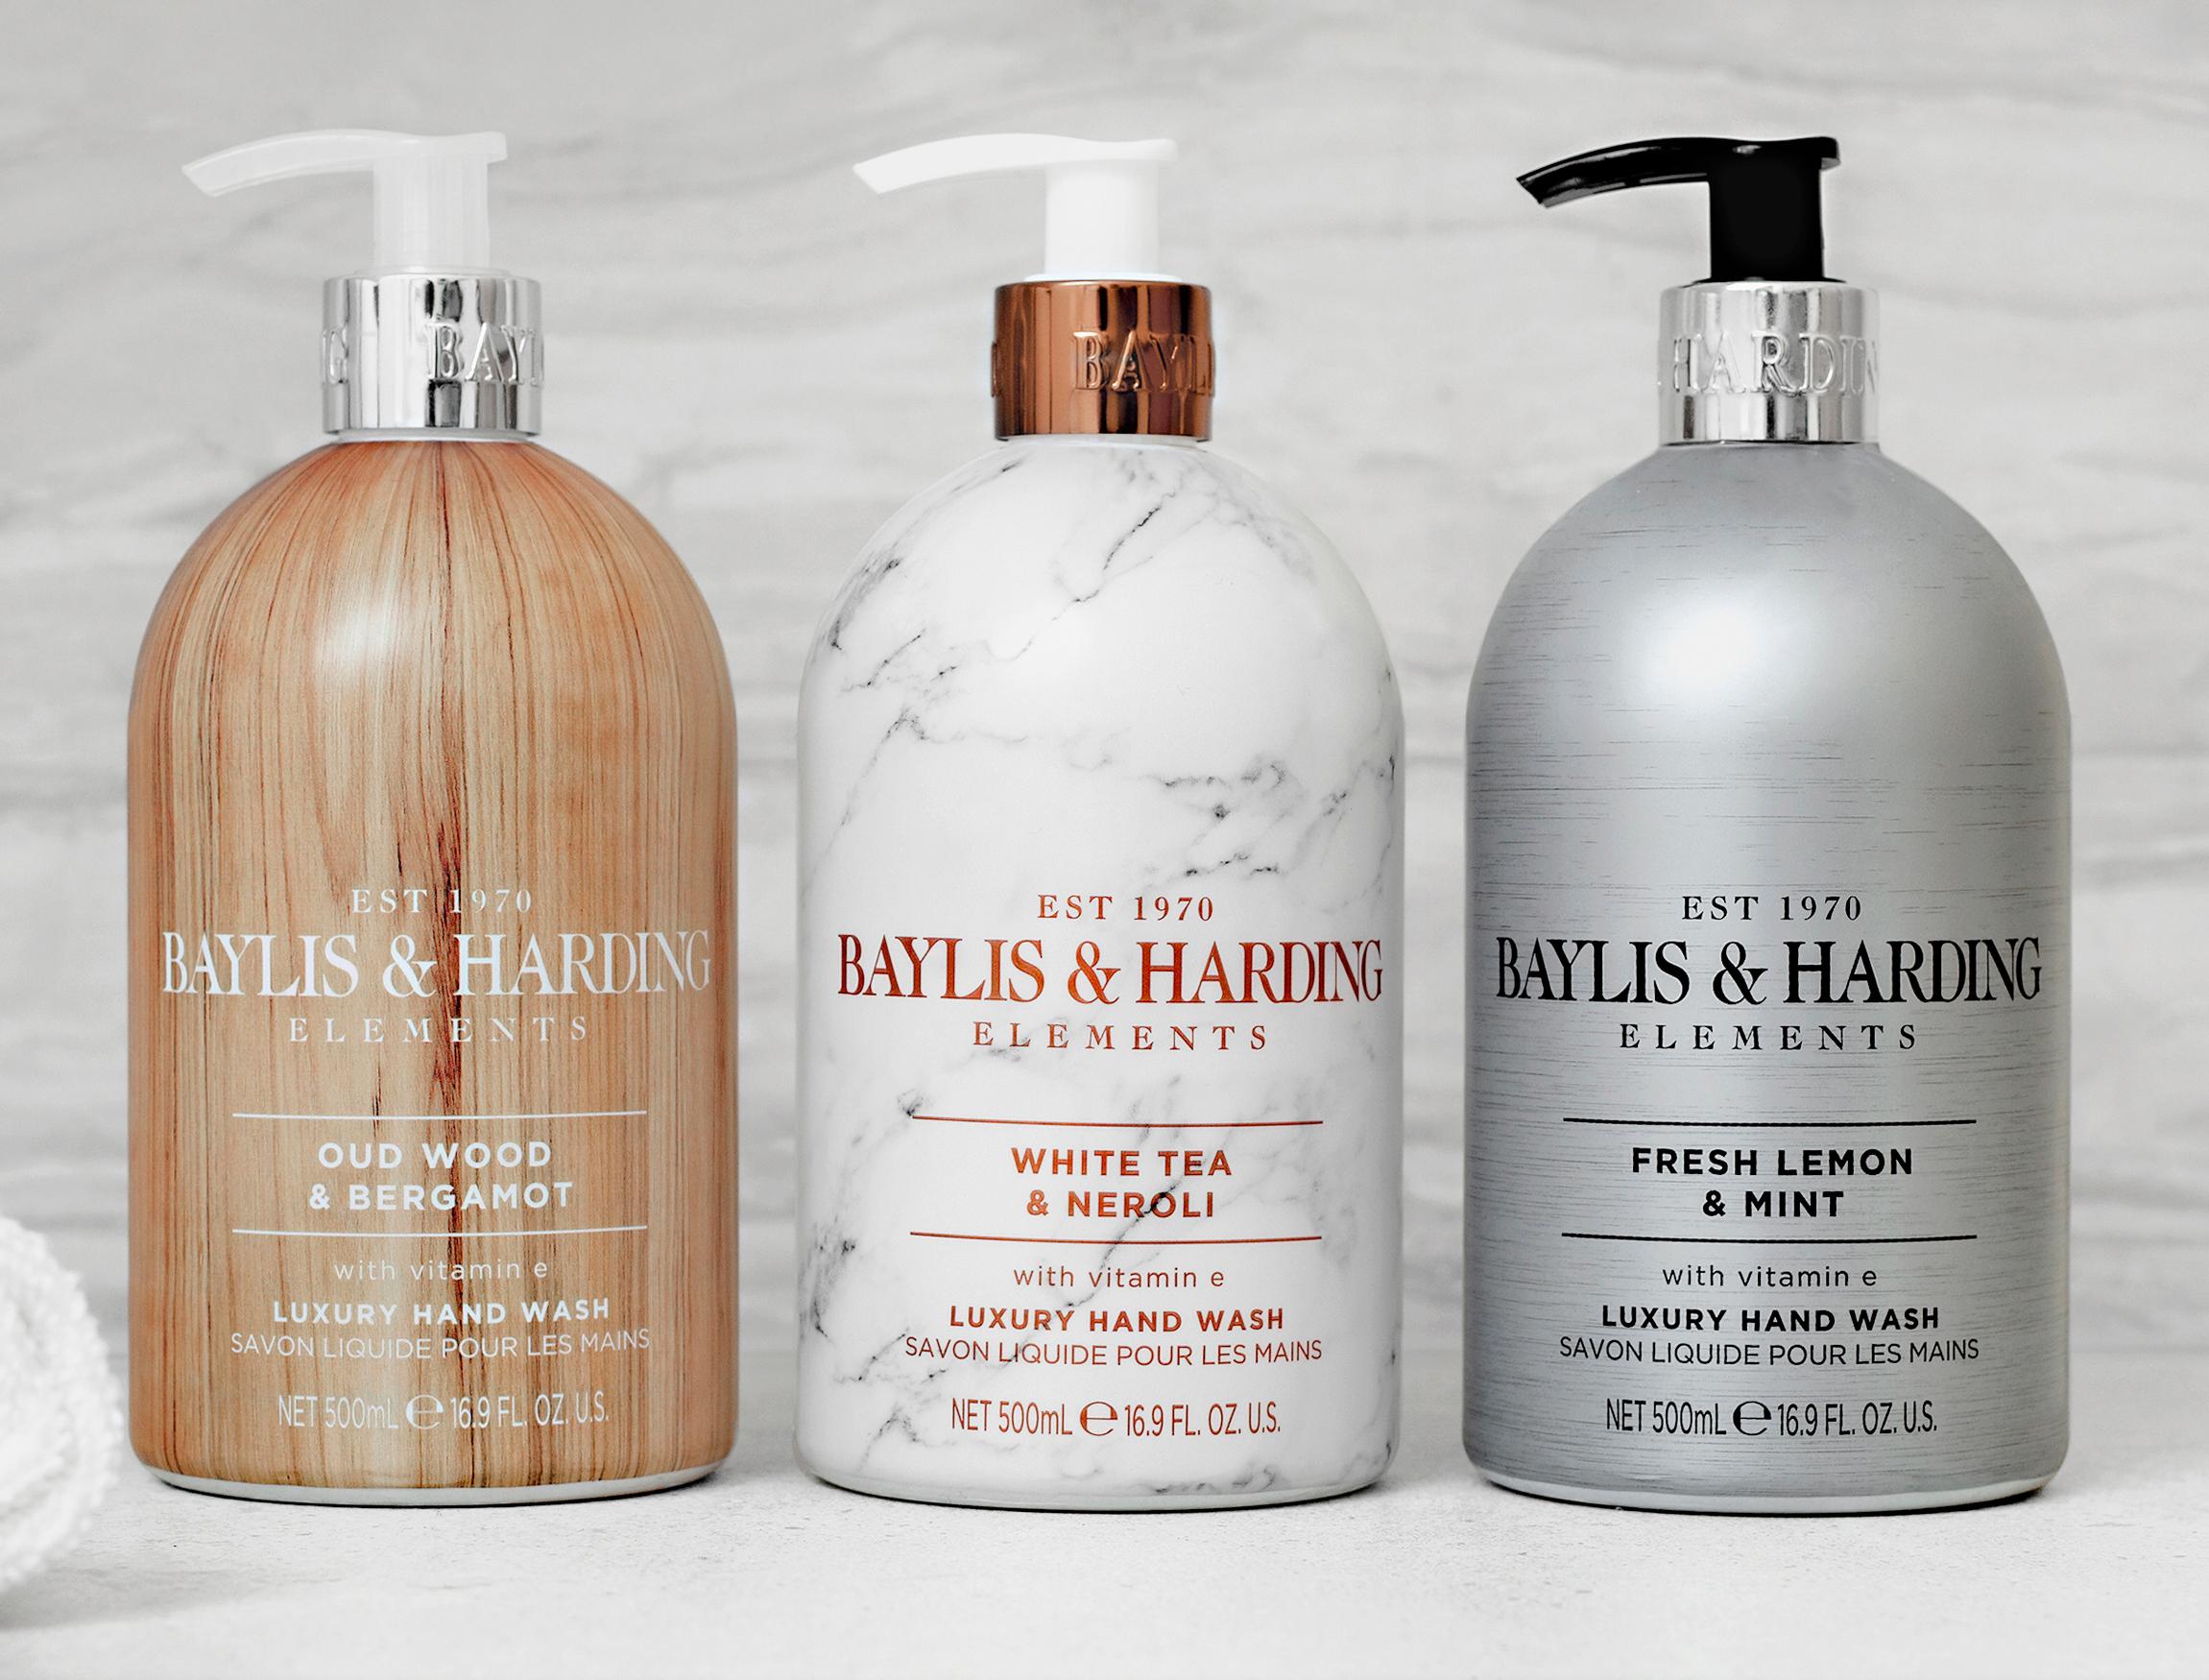 Baylis & Harding Elements Luxury Hand Wash White Tea & Neroli or Lemon & Mint or Oud & Bergamot 500ml for £1.50 each @ Morrisons